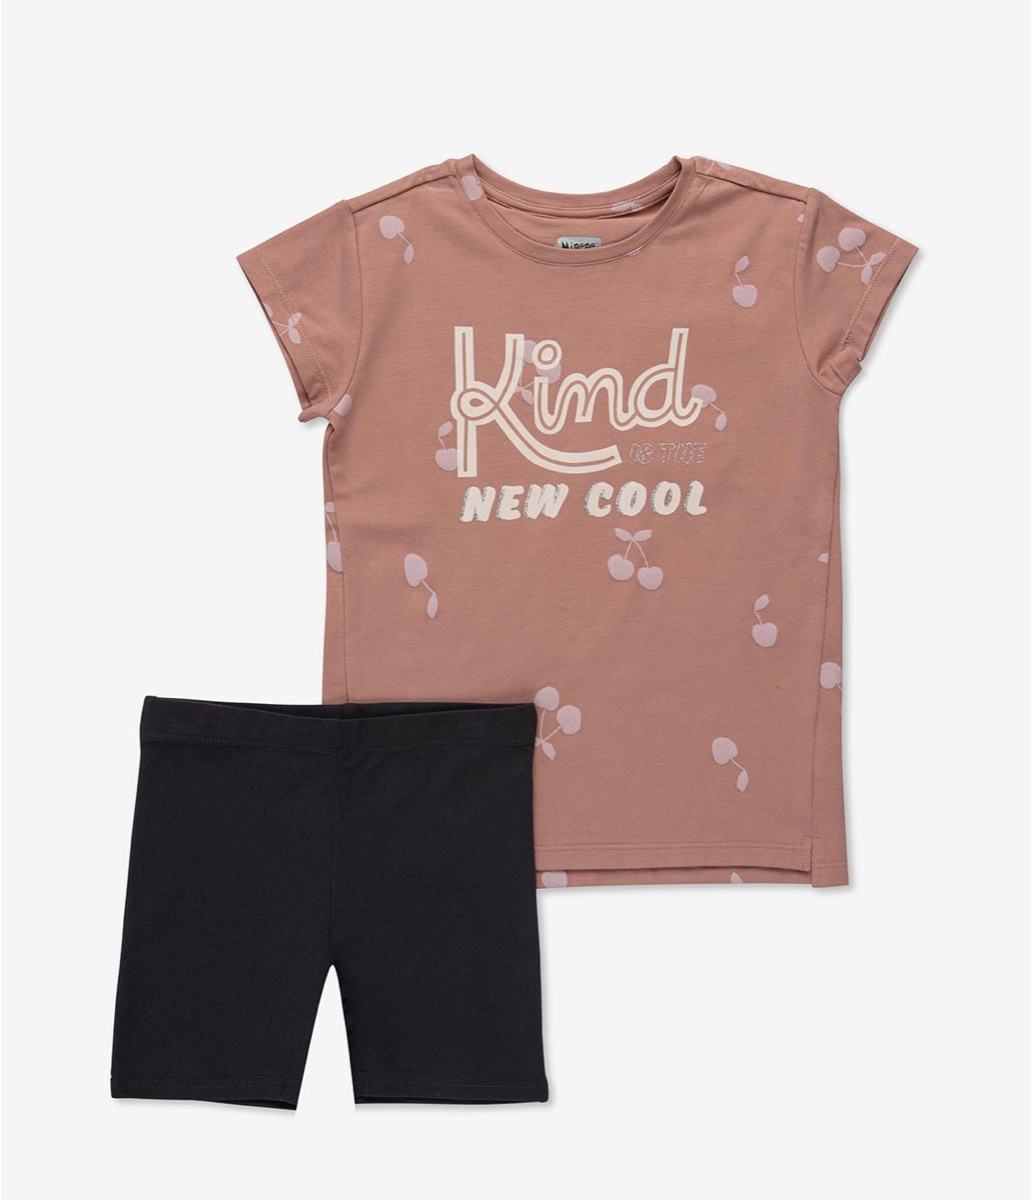 MINENE סט חולצה ומכנסיים דובדבן מידות 2-7